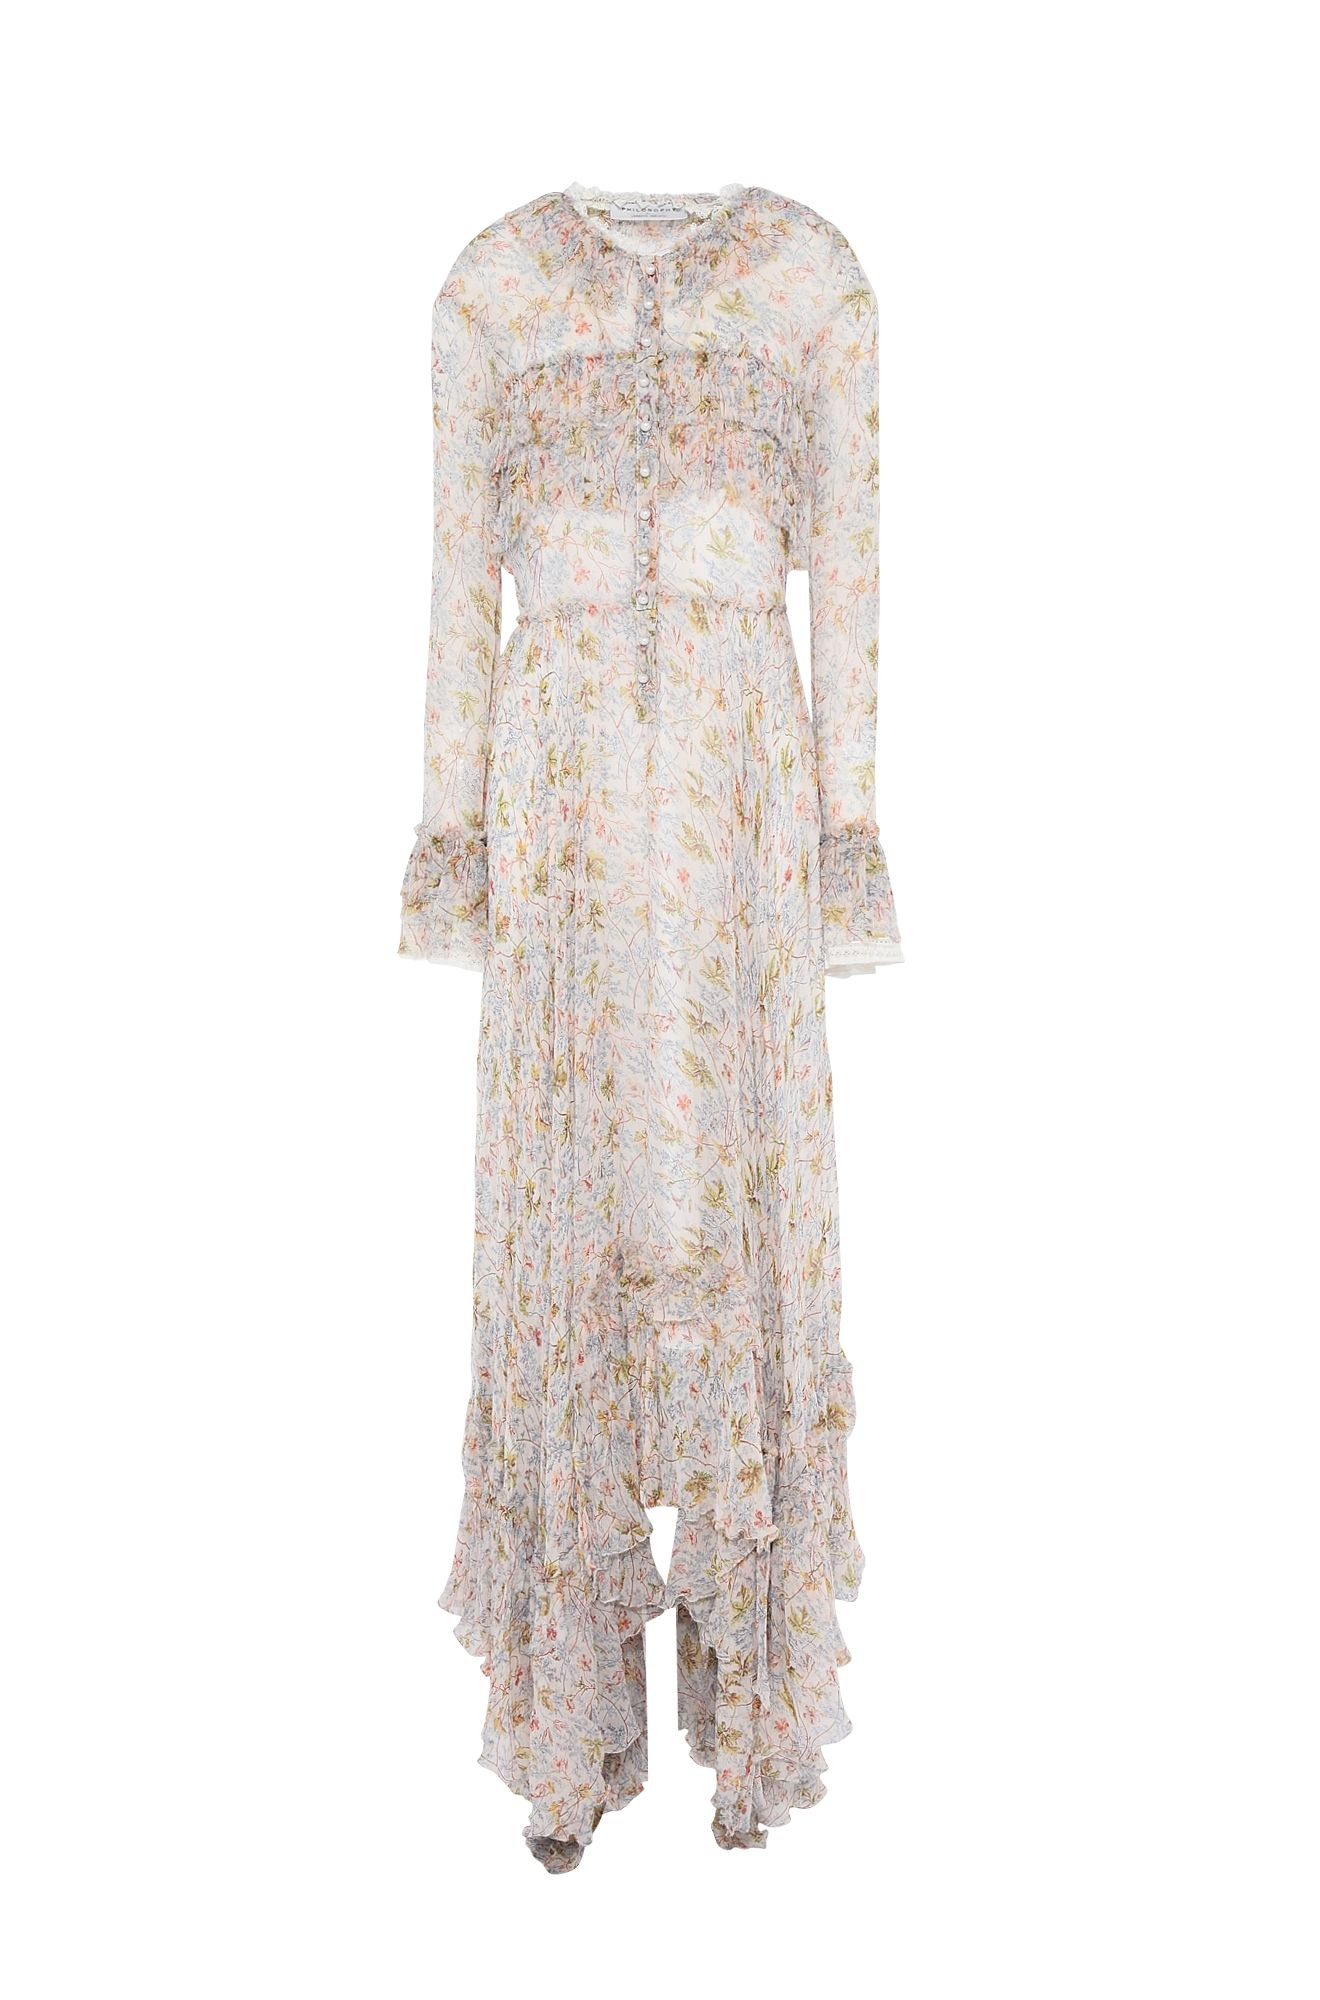 CASTAWAY FLORAL DRESS